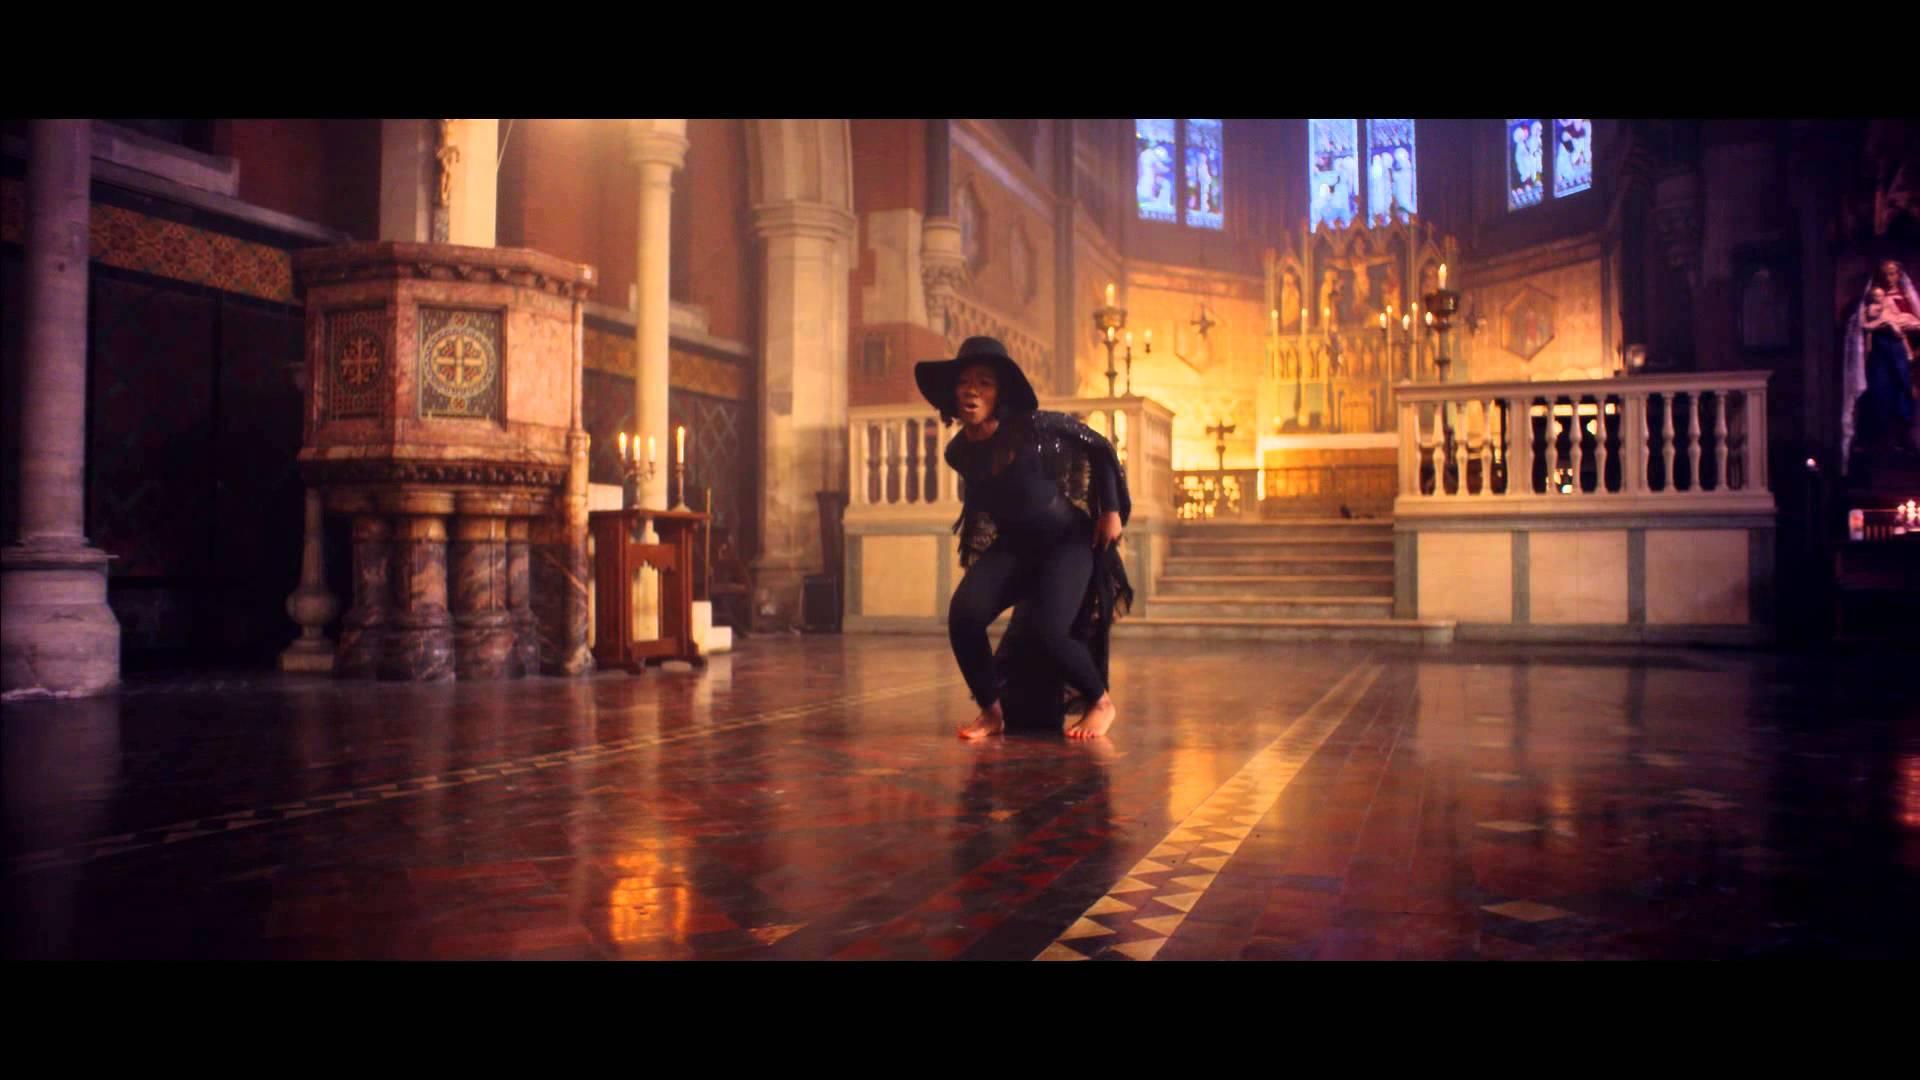 Download video: asa – satan be gone novice2star.